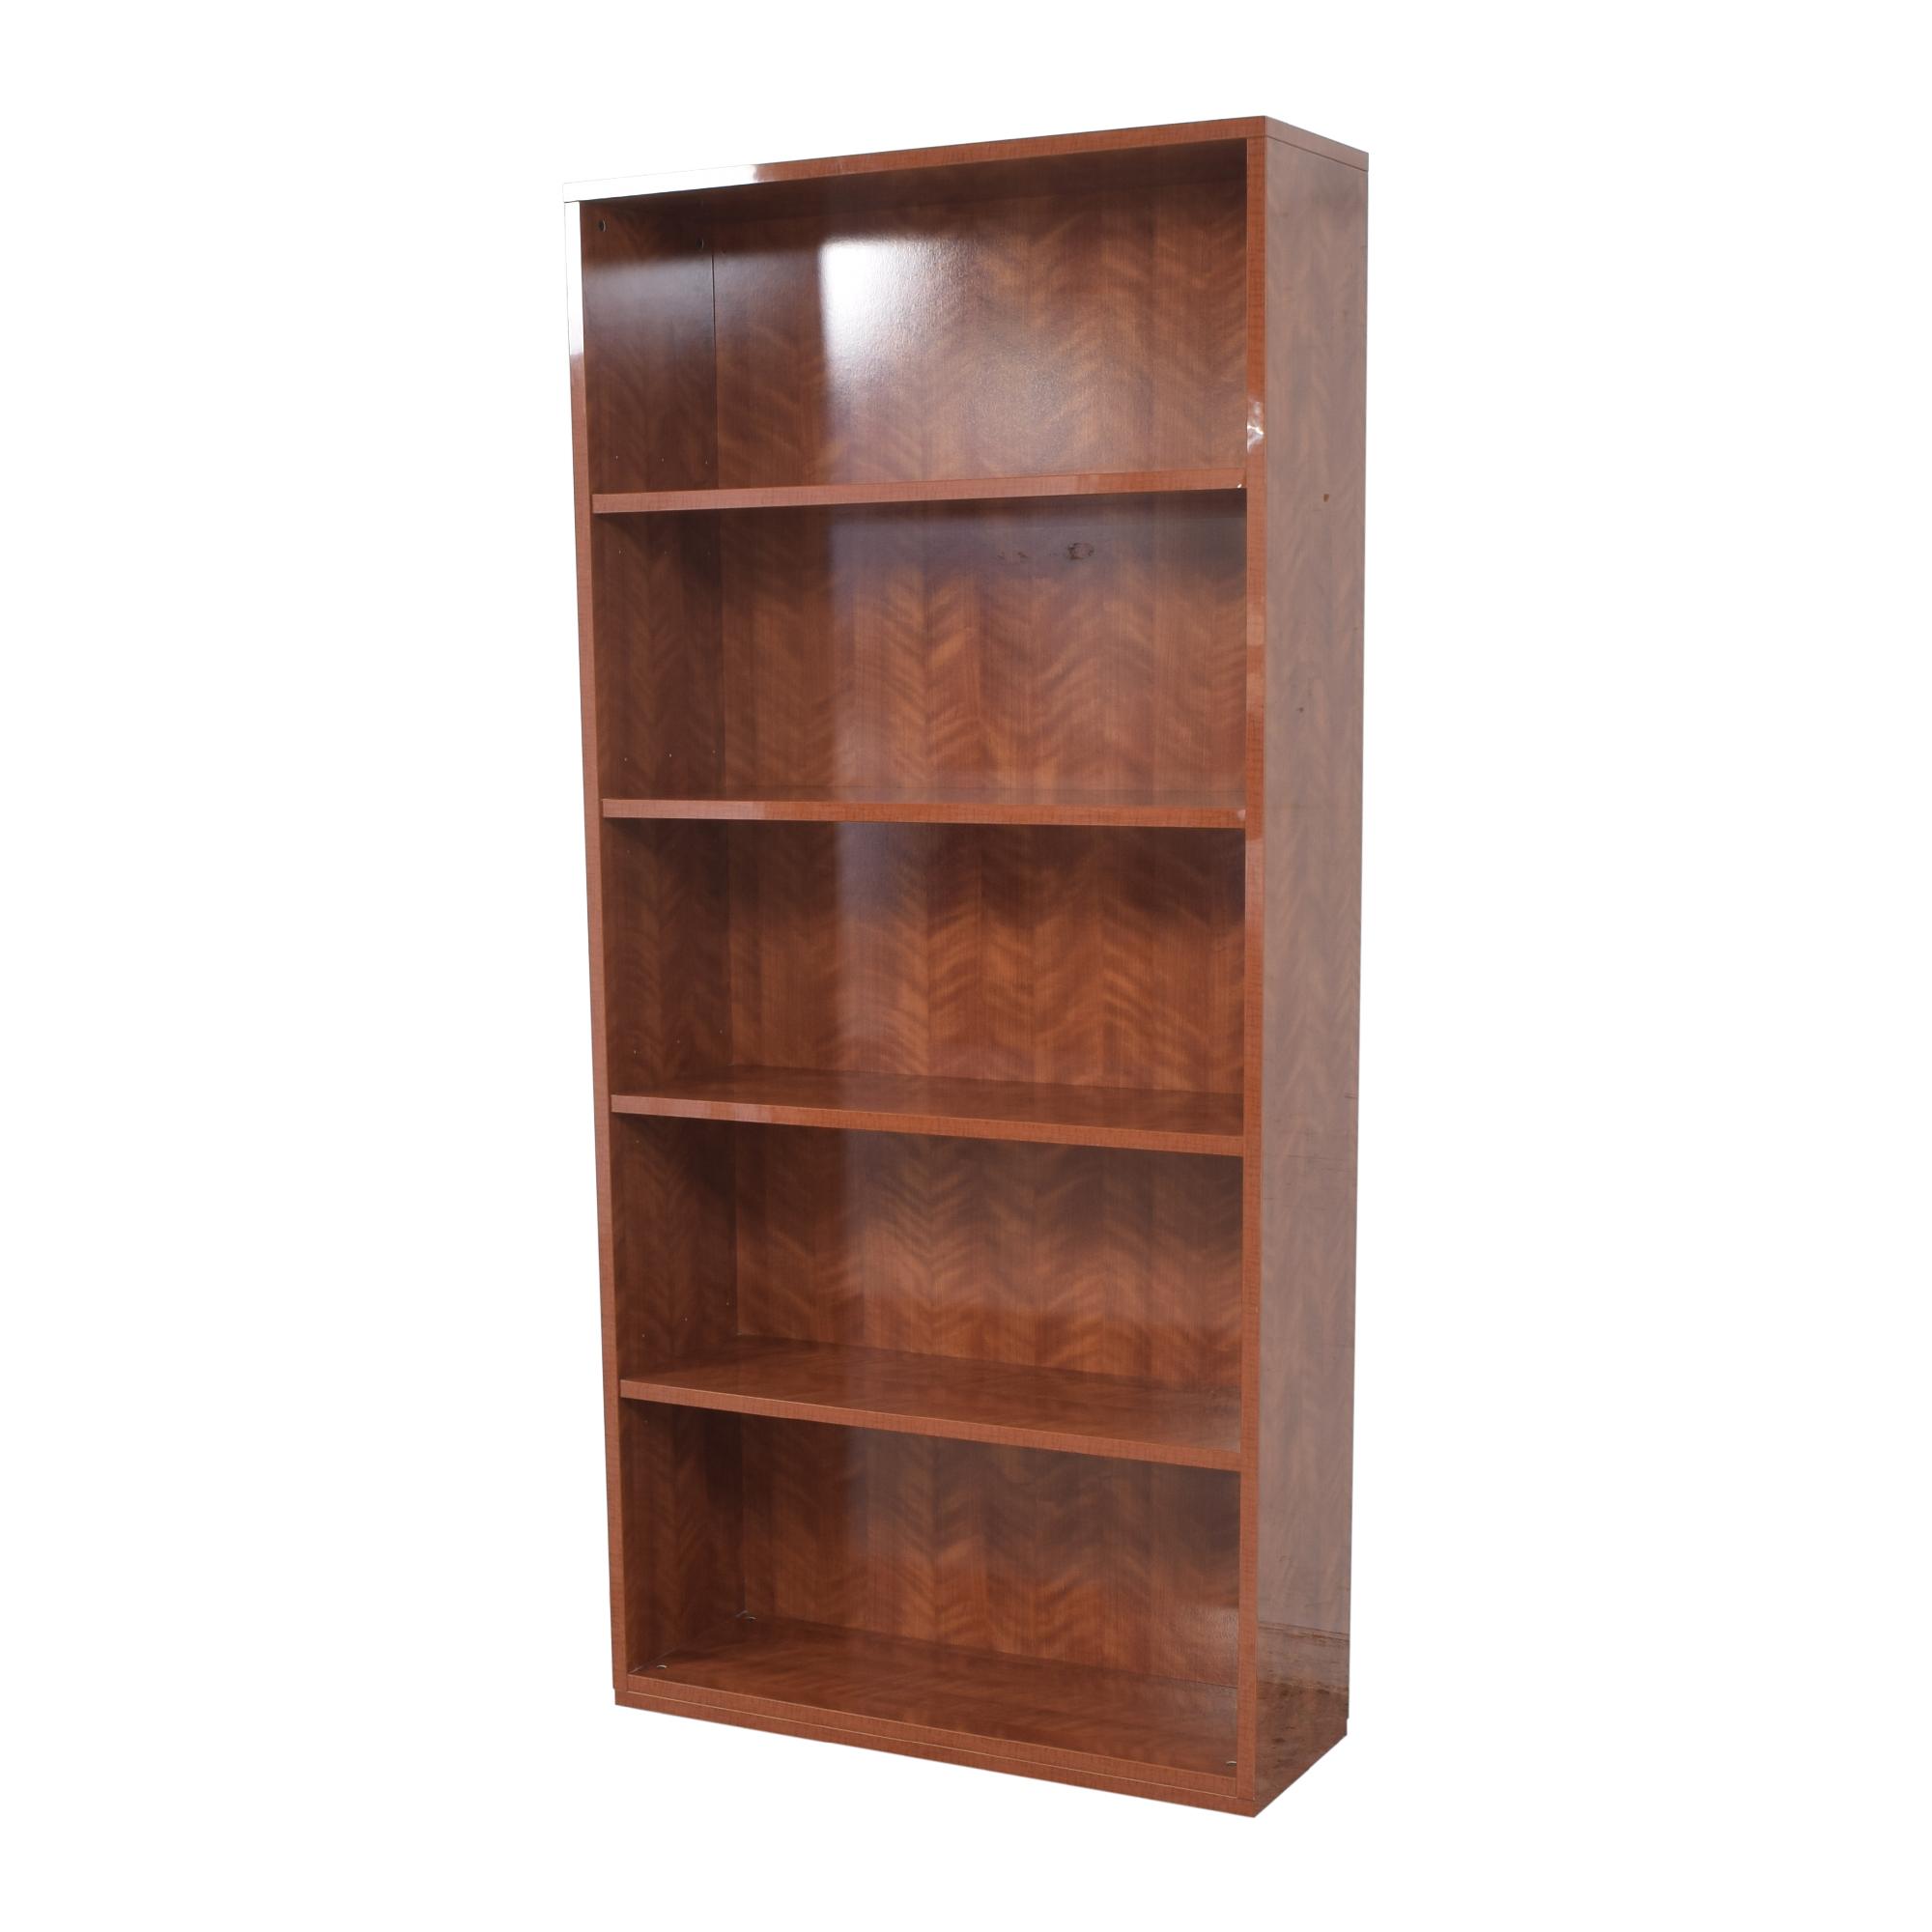 Alf Italia Alf Italia Tall Bookcase nyc